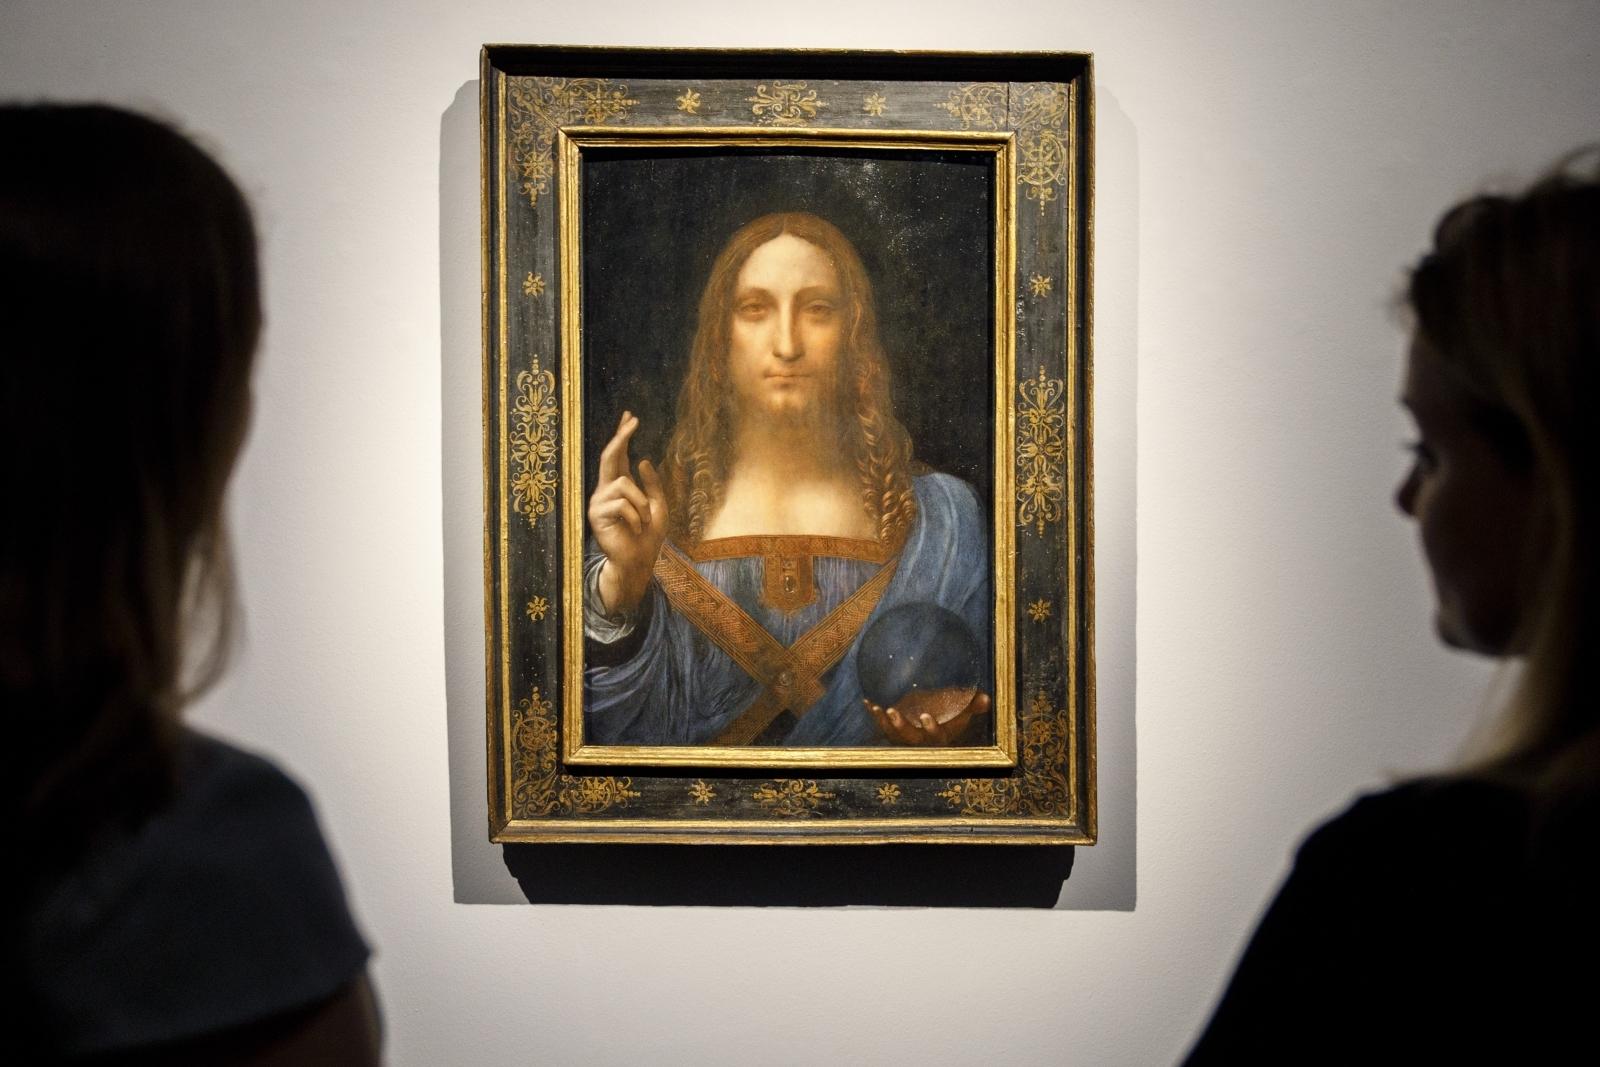 Leonardo Salvator Mundi 450m >> Leonardo da Vinci's Salvator Mundi painting bought for $60 in 1958 sells for record $450m in 2017